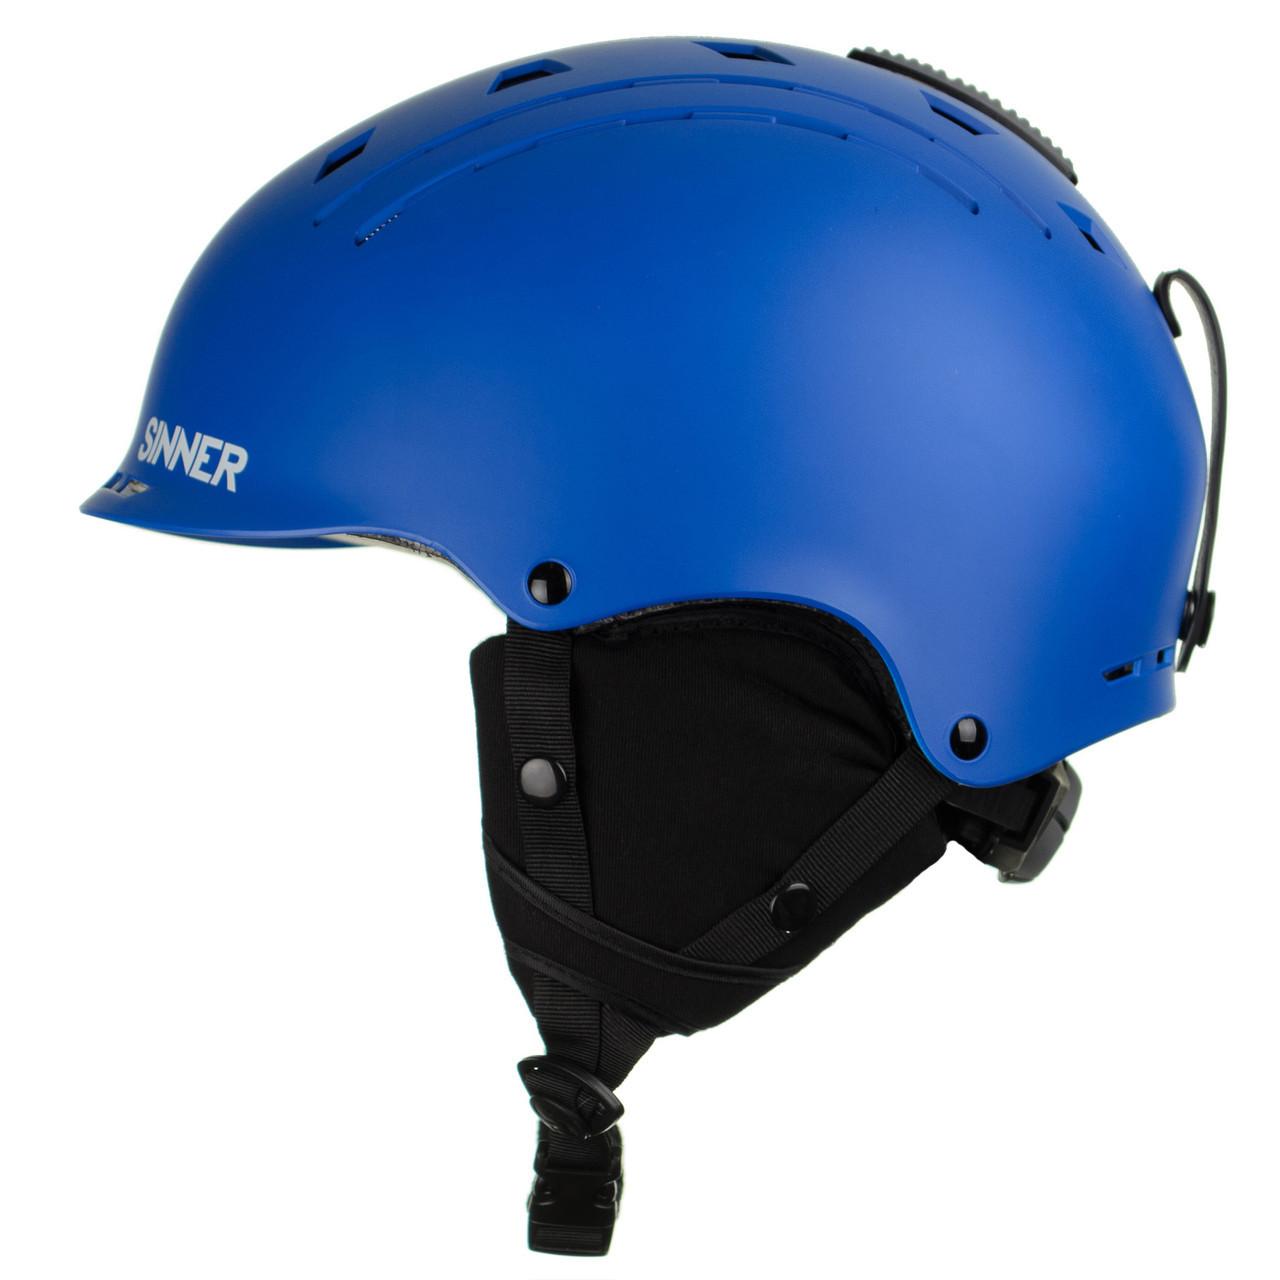 Шолом гірськолижний Sinner Pincher XS Matte Bright Blue (SIHE-136-50Z-54)